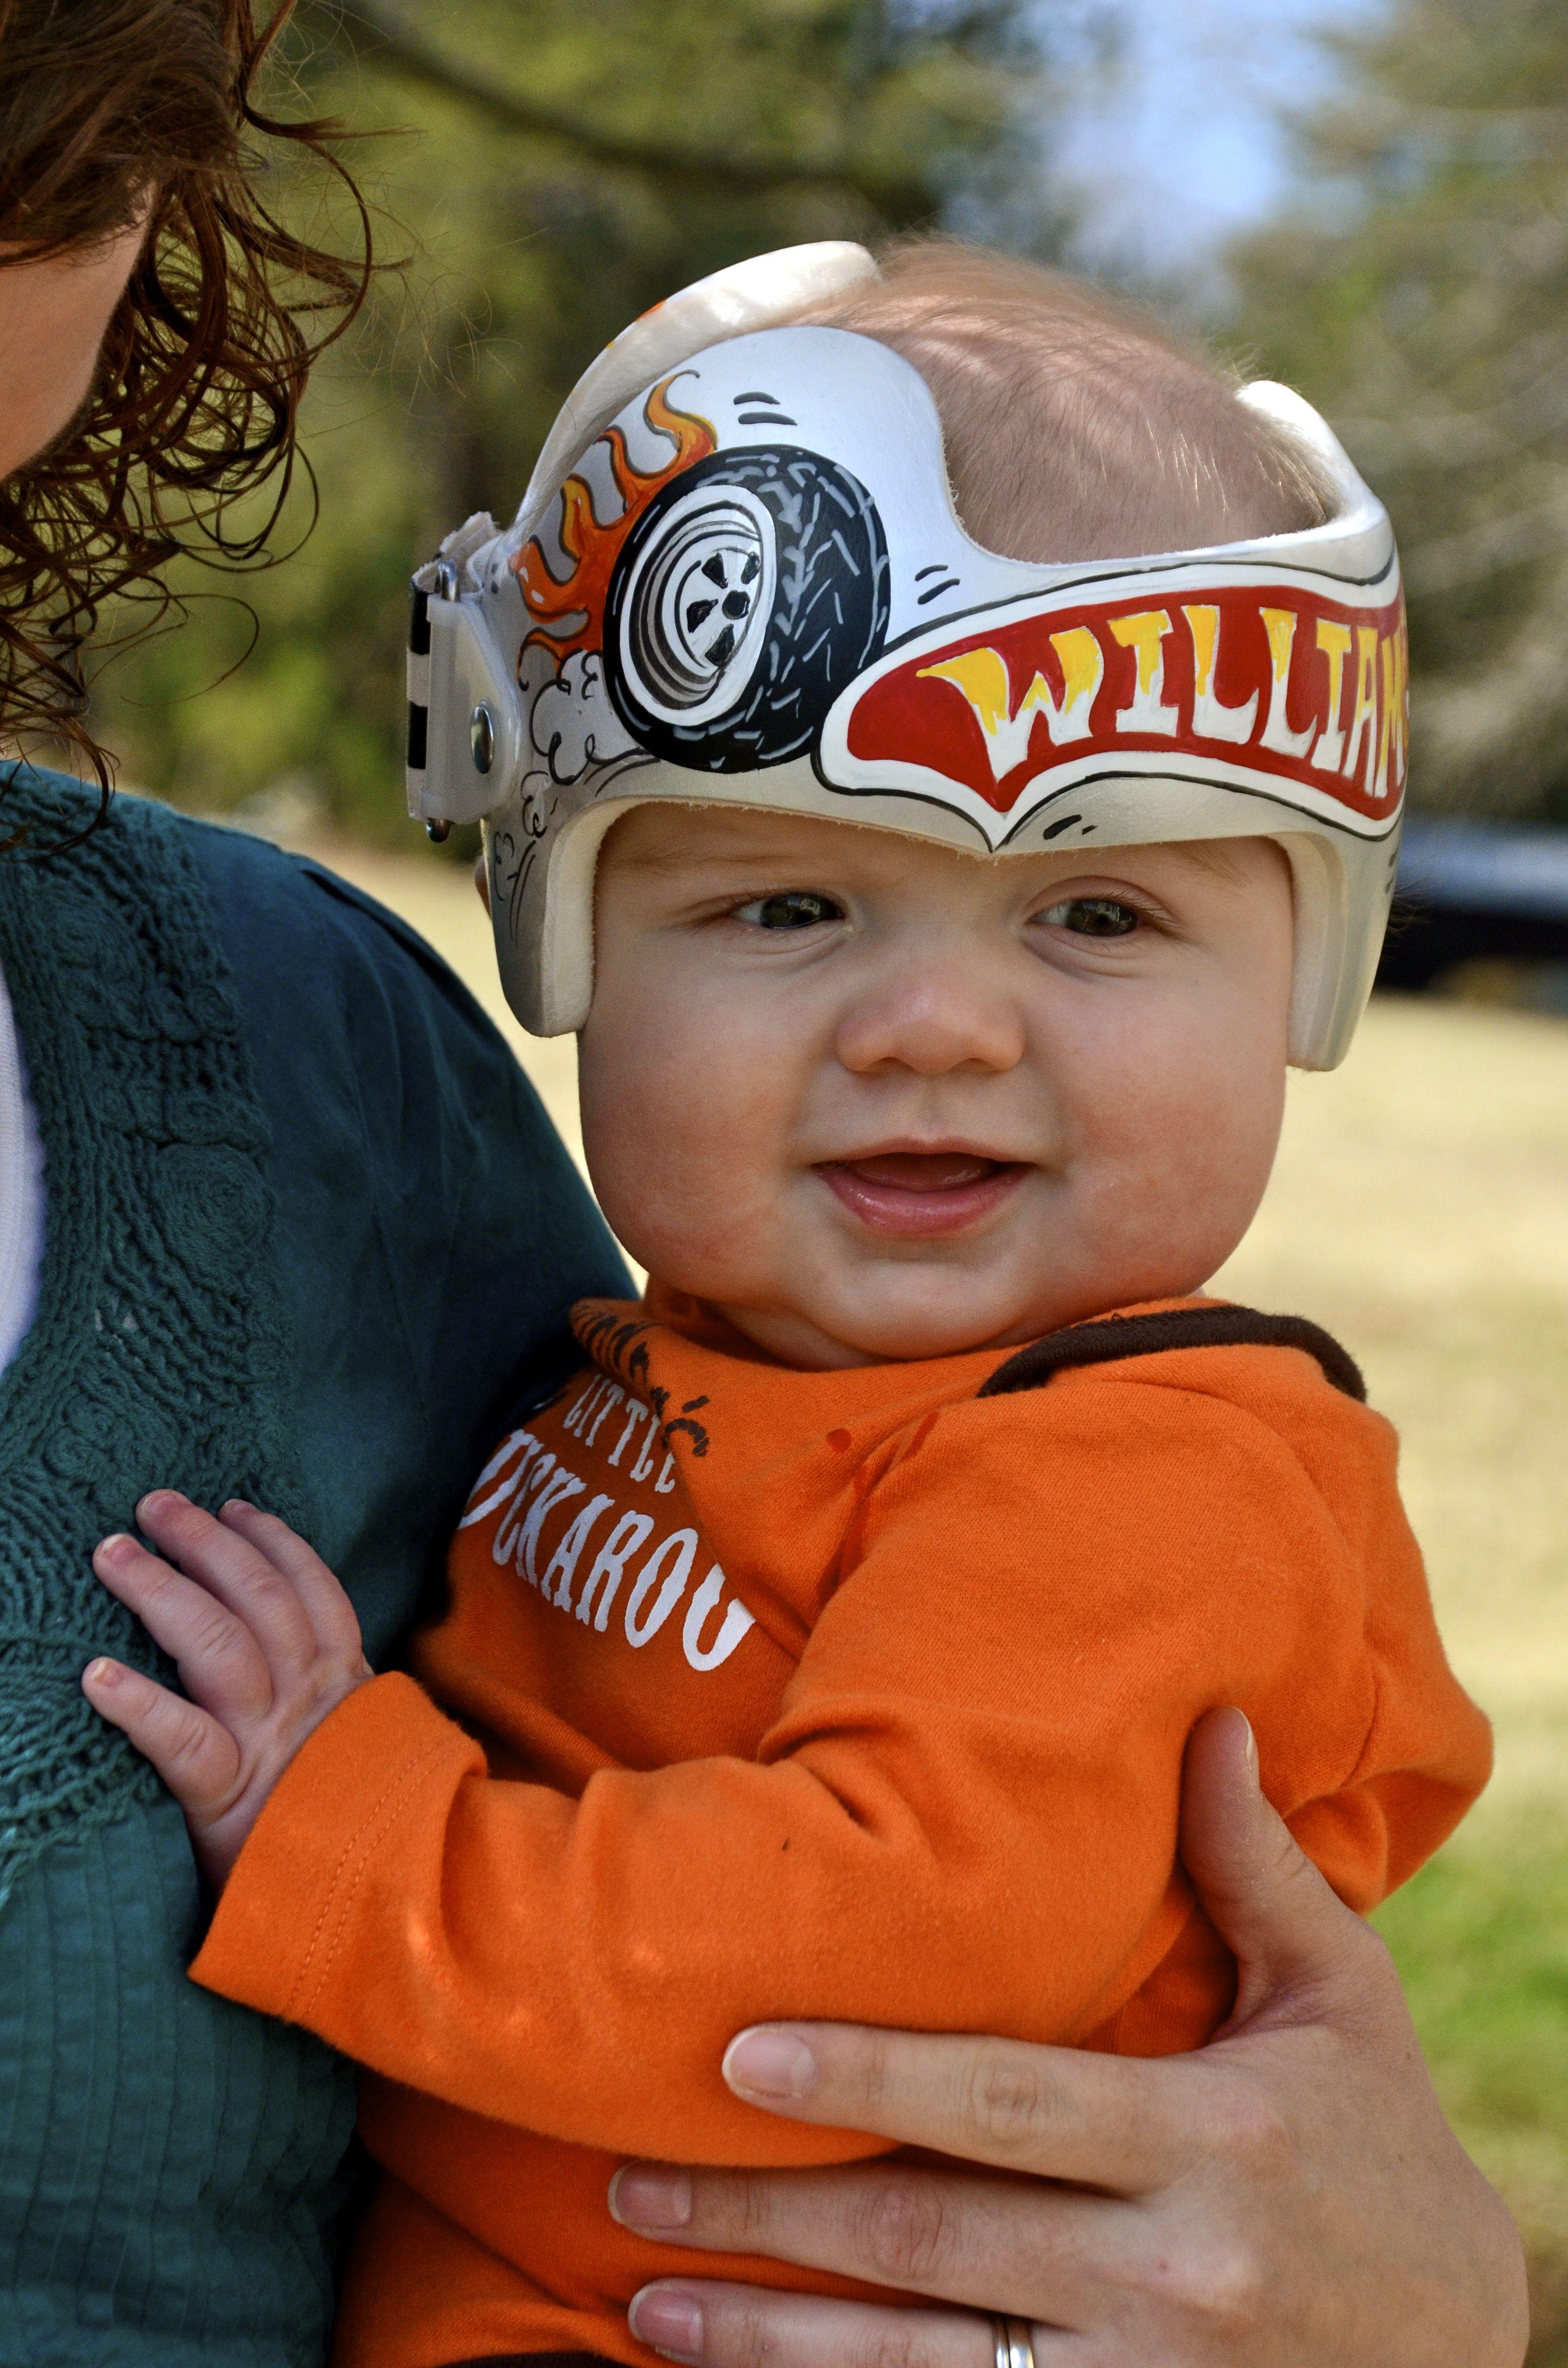 Hot Wheels Themed Cranial Band Www Treasuredinteriors Net Baby Helmet Doc Band Designs Doc Band